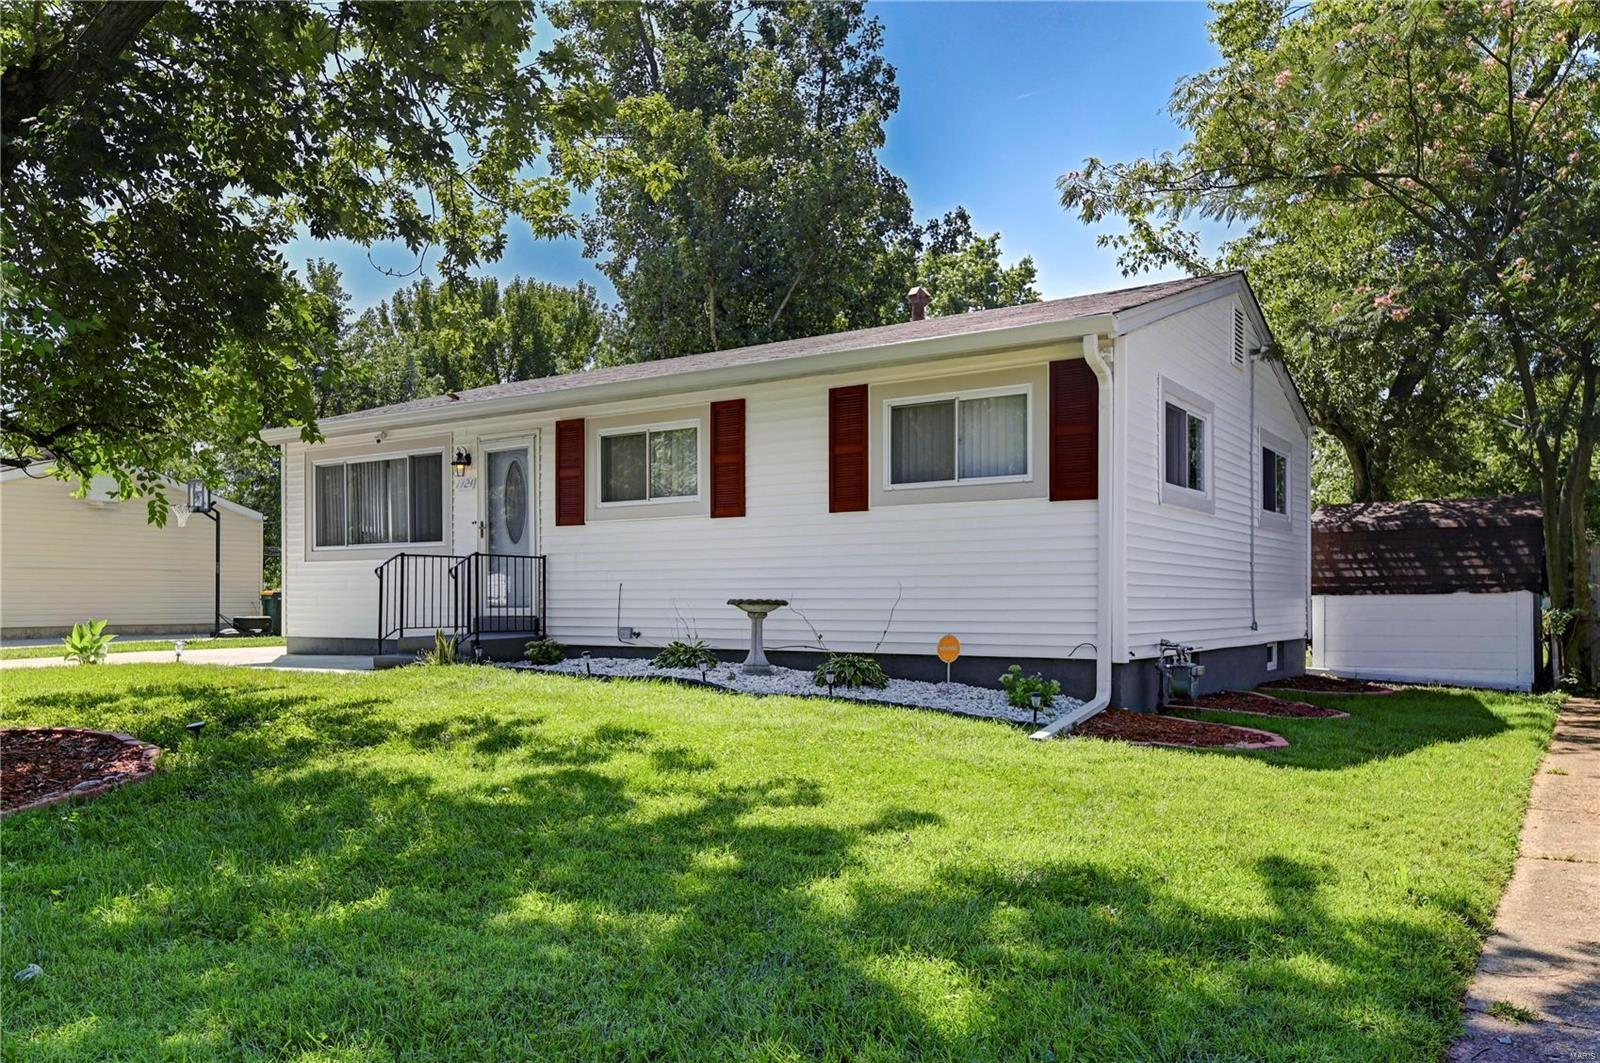 1424 Widefields Lane, Saint Louis, MO 63138 - MLS#: 21020649